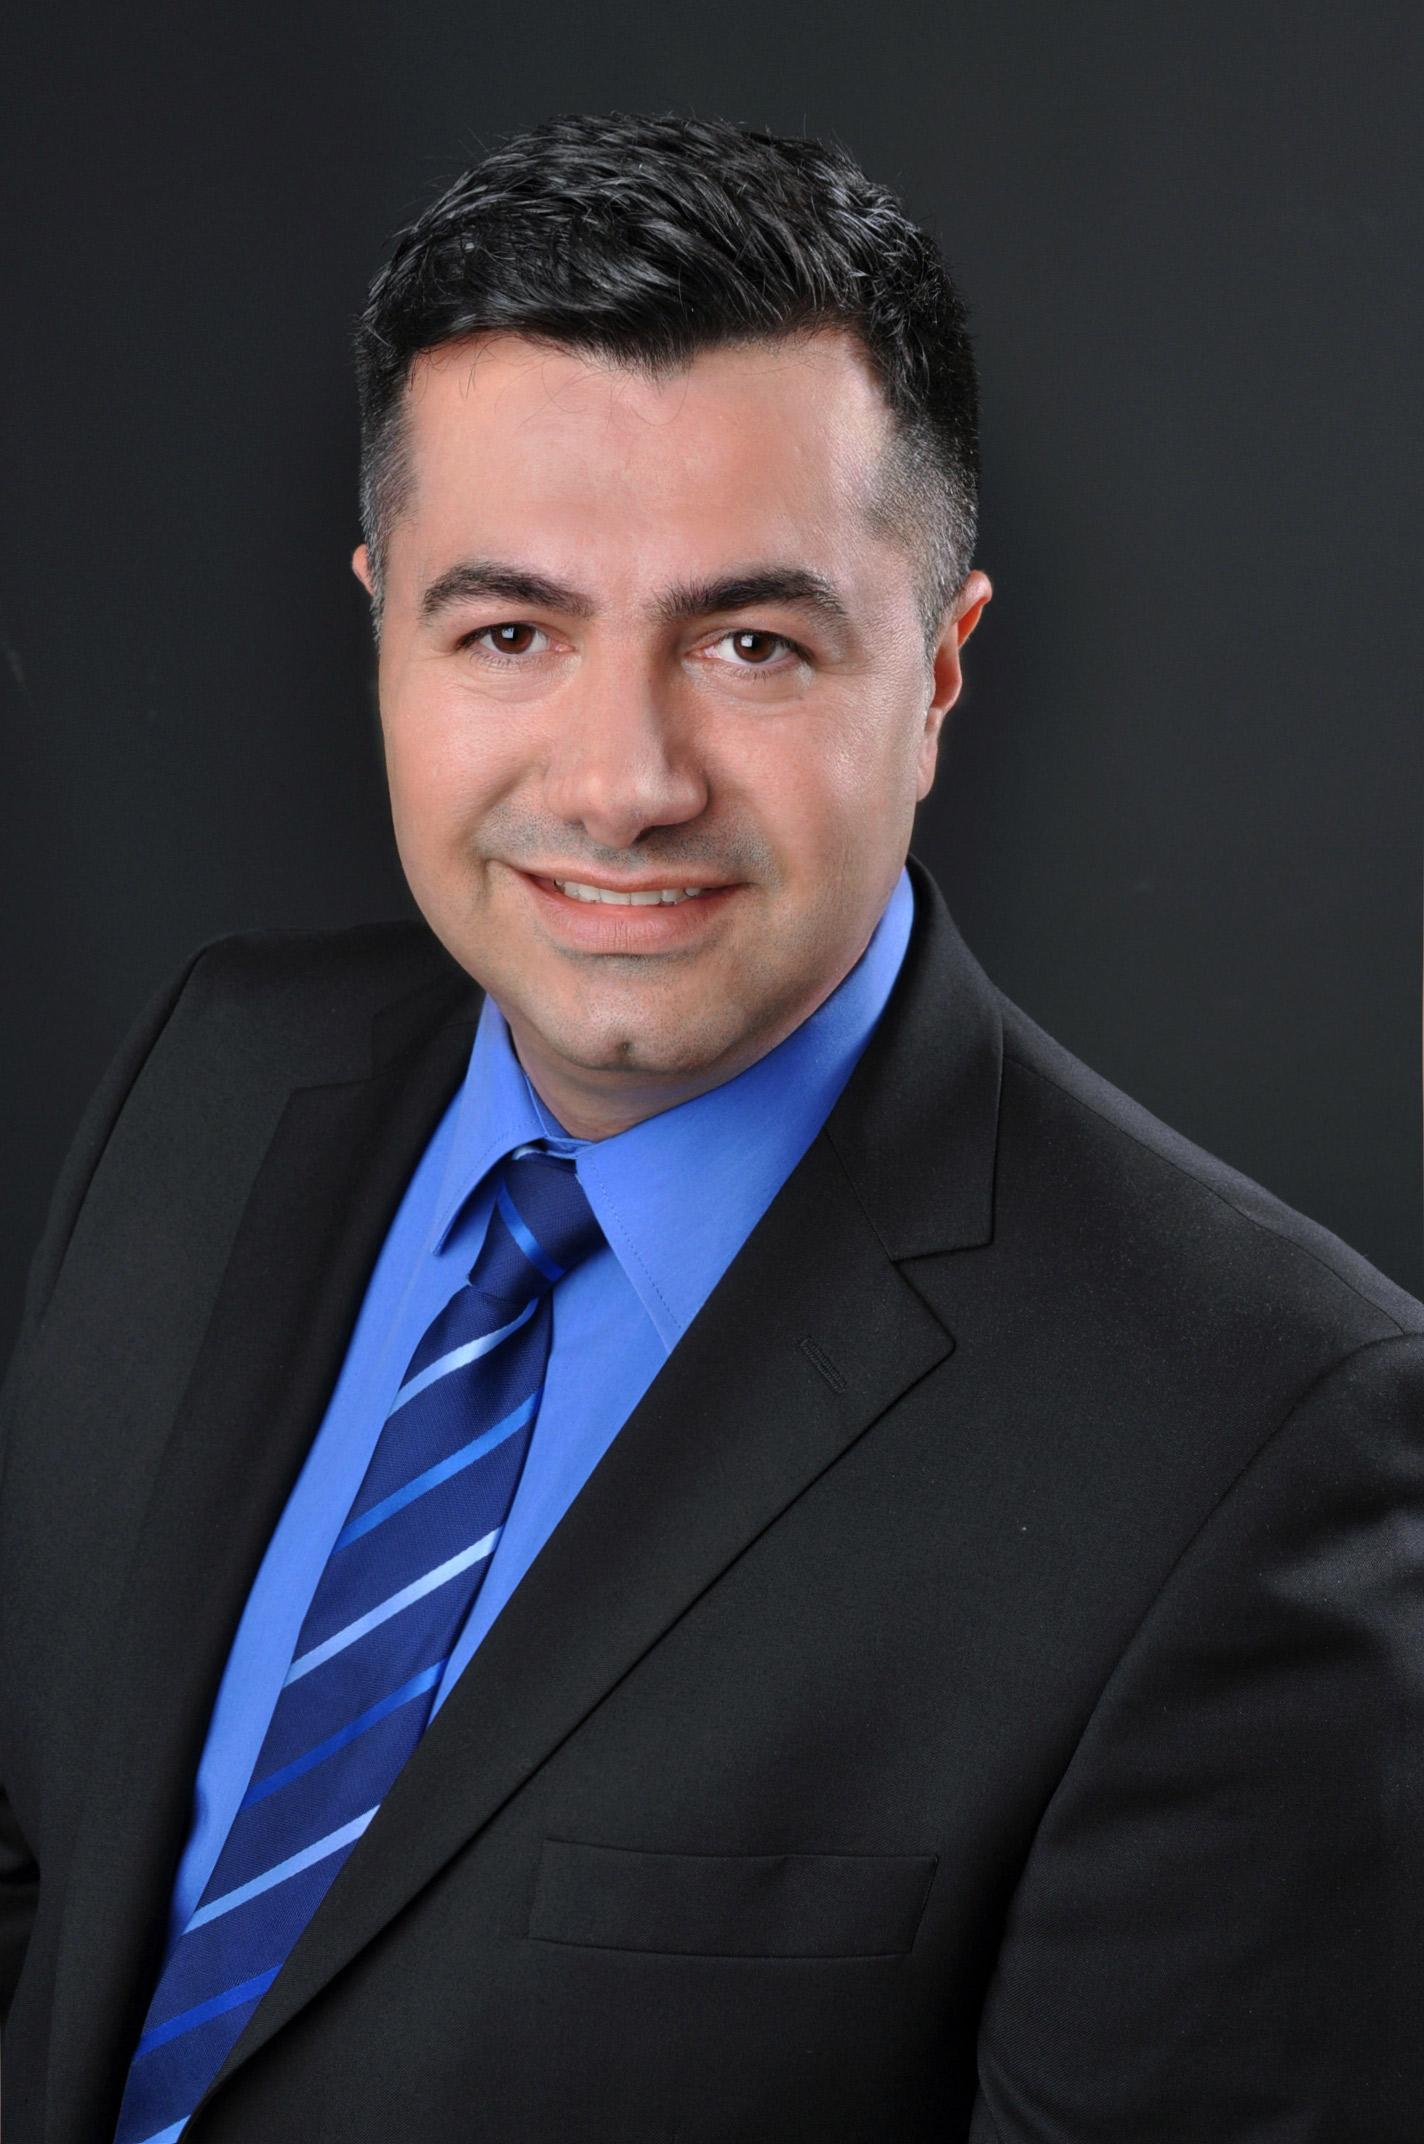 Geschäftsführer ASG SECURA GmbH Kambiz Angourani